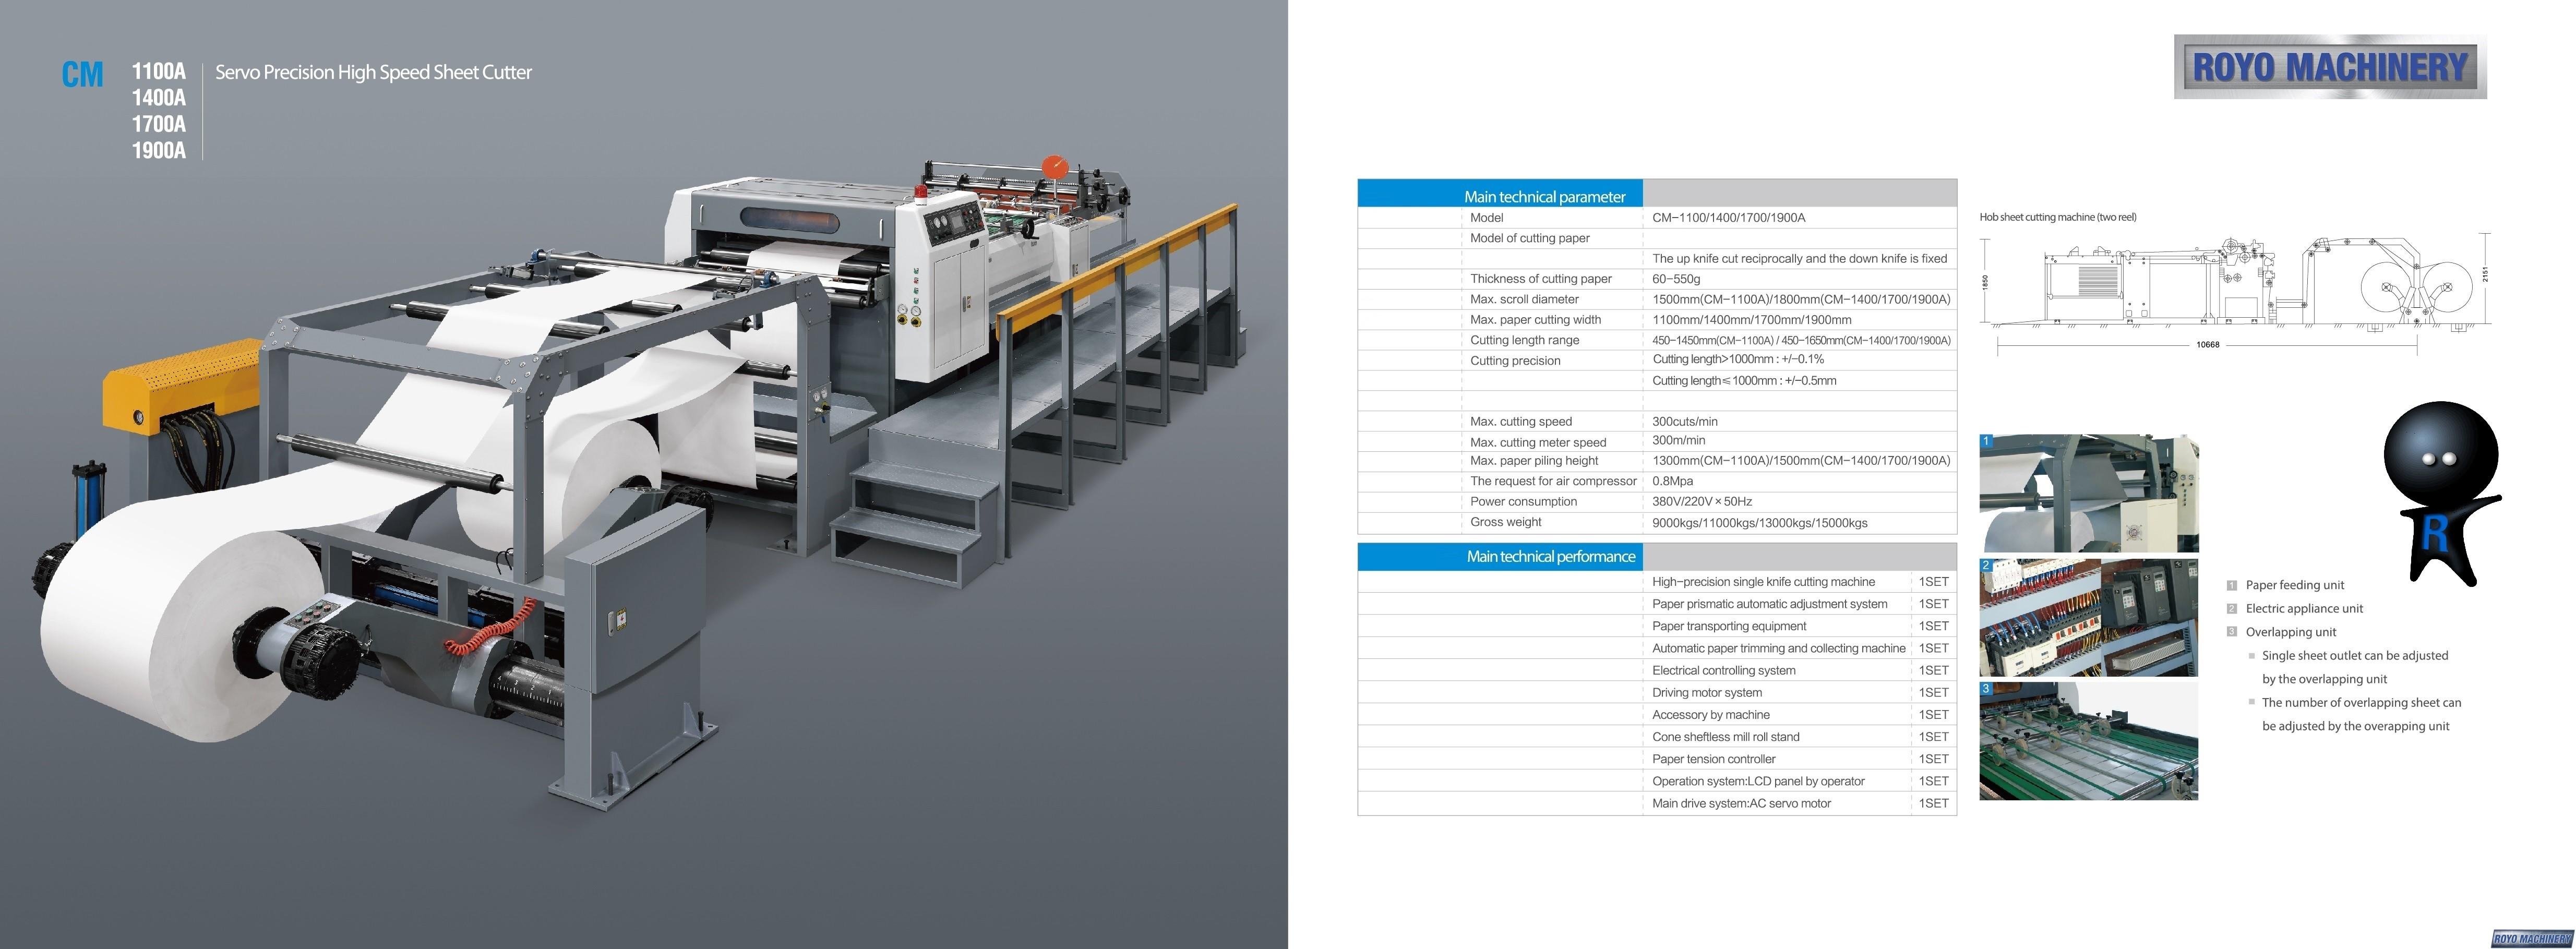 Royo Machinery RCM-1400A-2